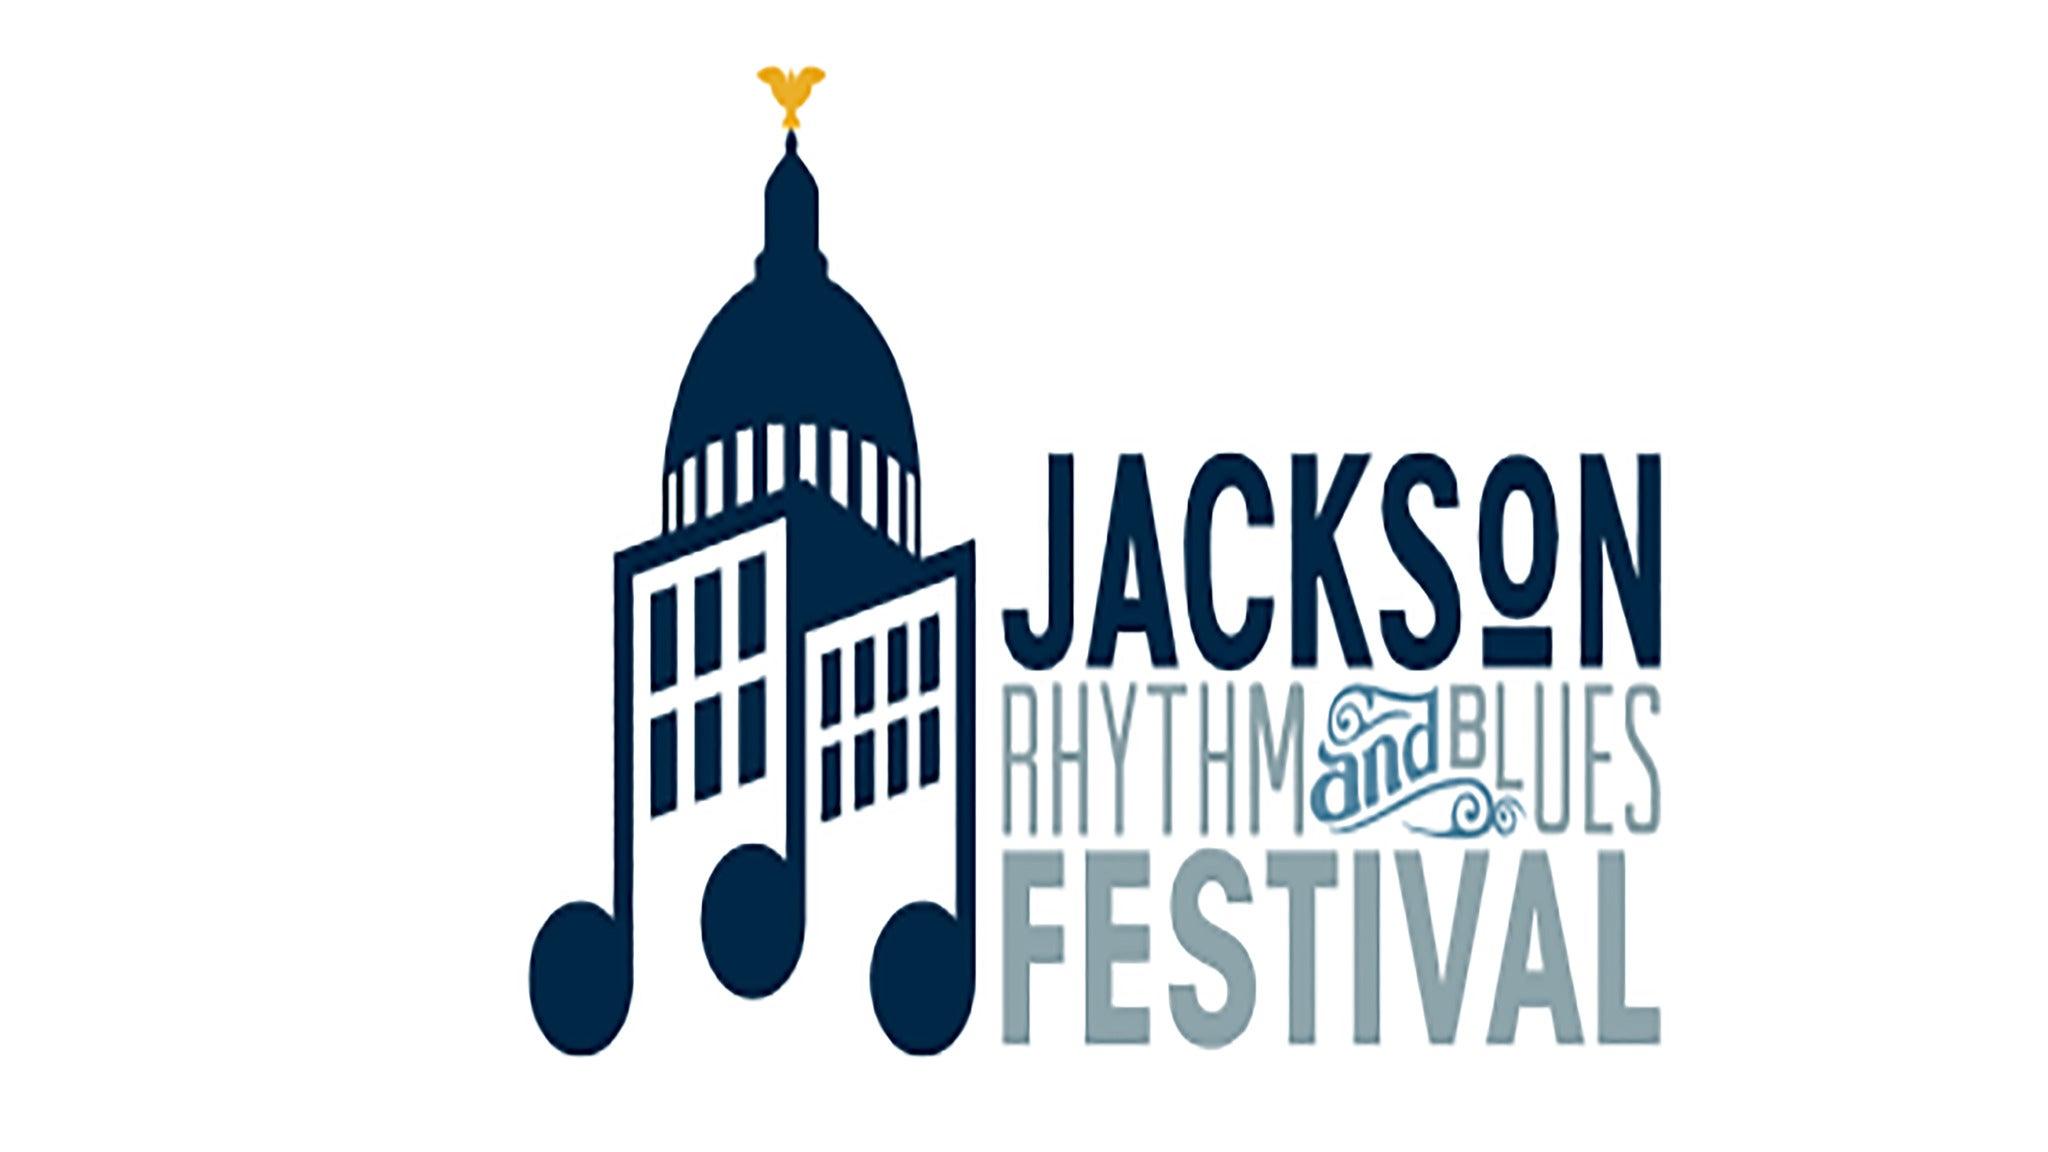 2017 Jackson Rhythm & Blues Festival - Friday